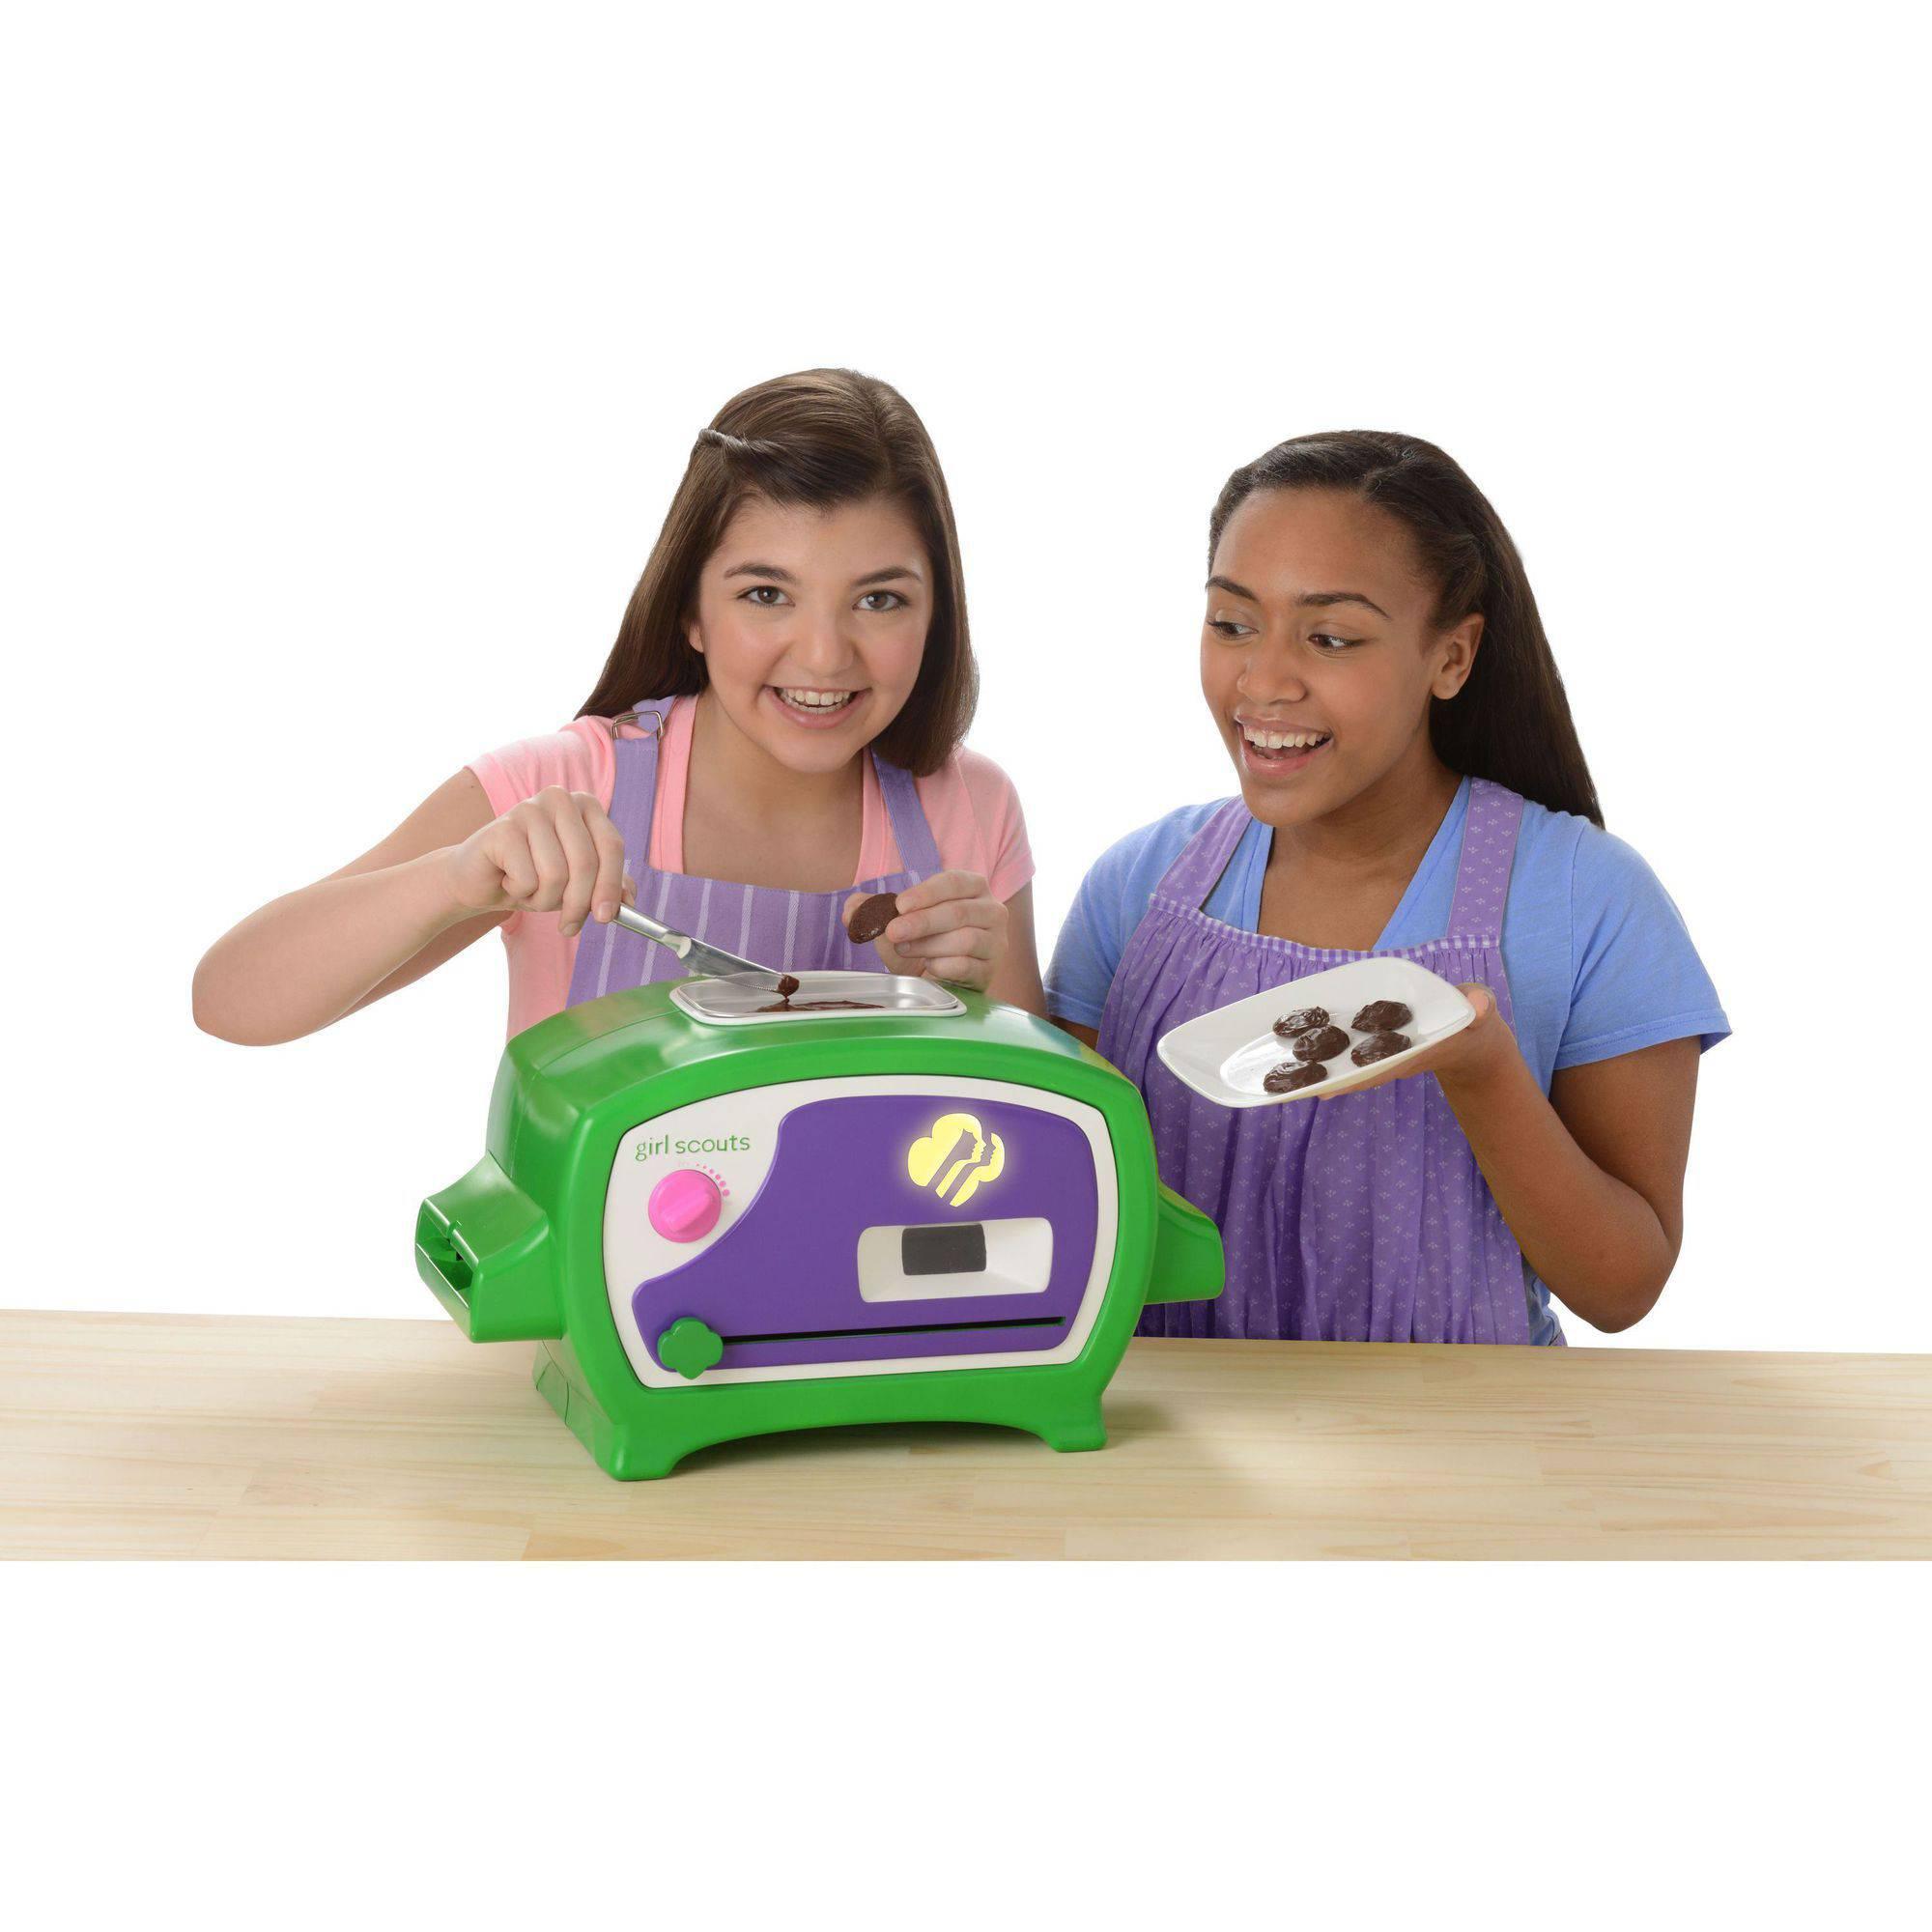 Girl Scouts Cookie Oven Walmart Com